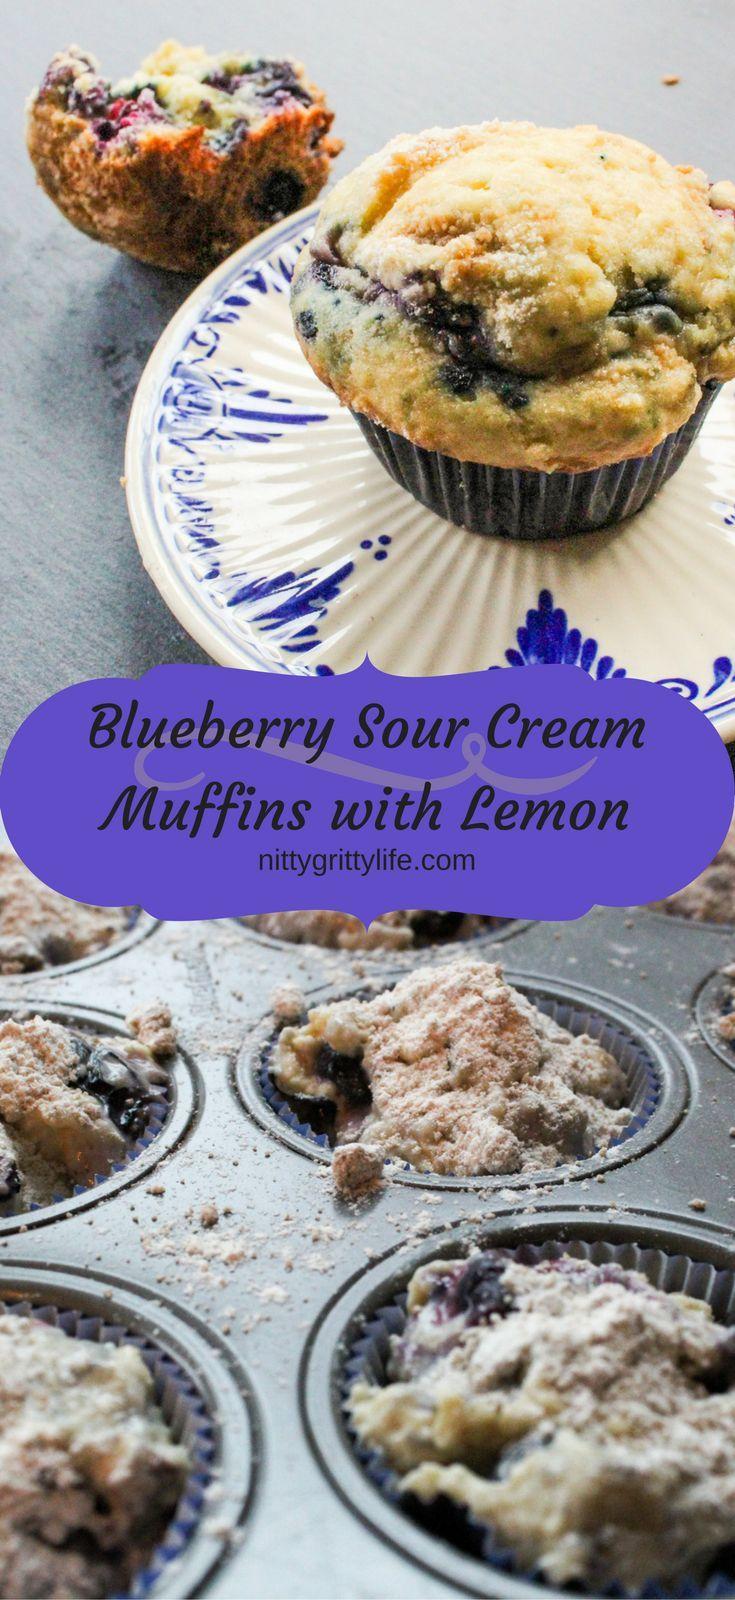 Blueberry Sour Cream Muffins With Lemon Recipe Sour Cream Blueberry Muffins Sour Cream Muffins Sour Cream